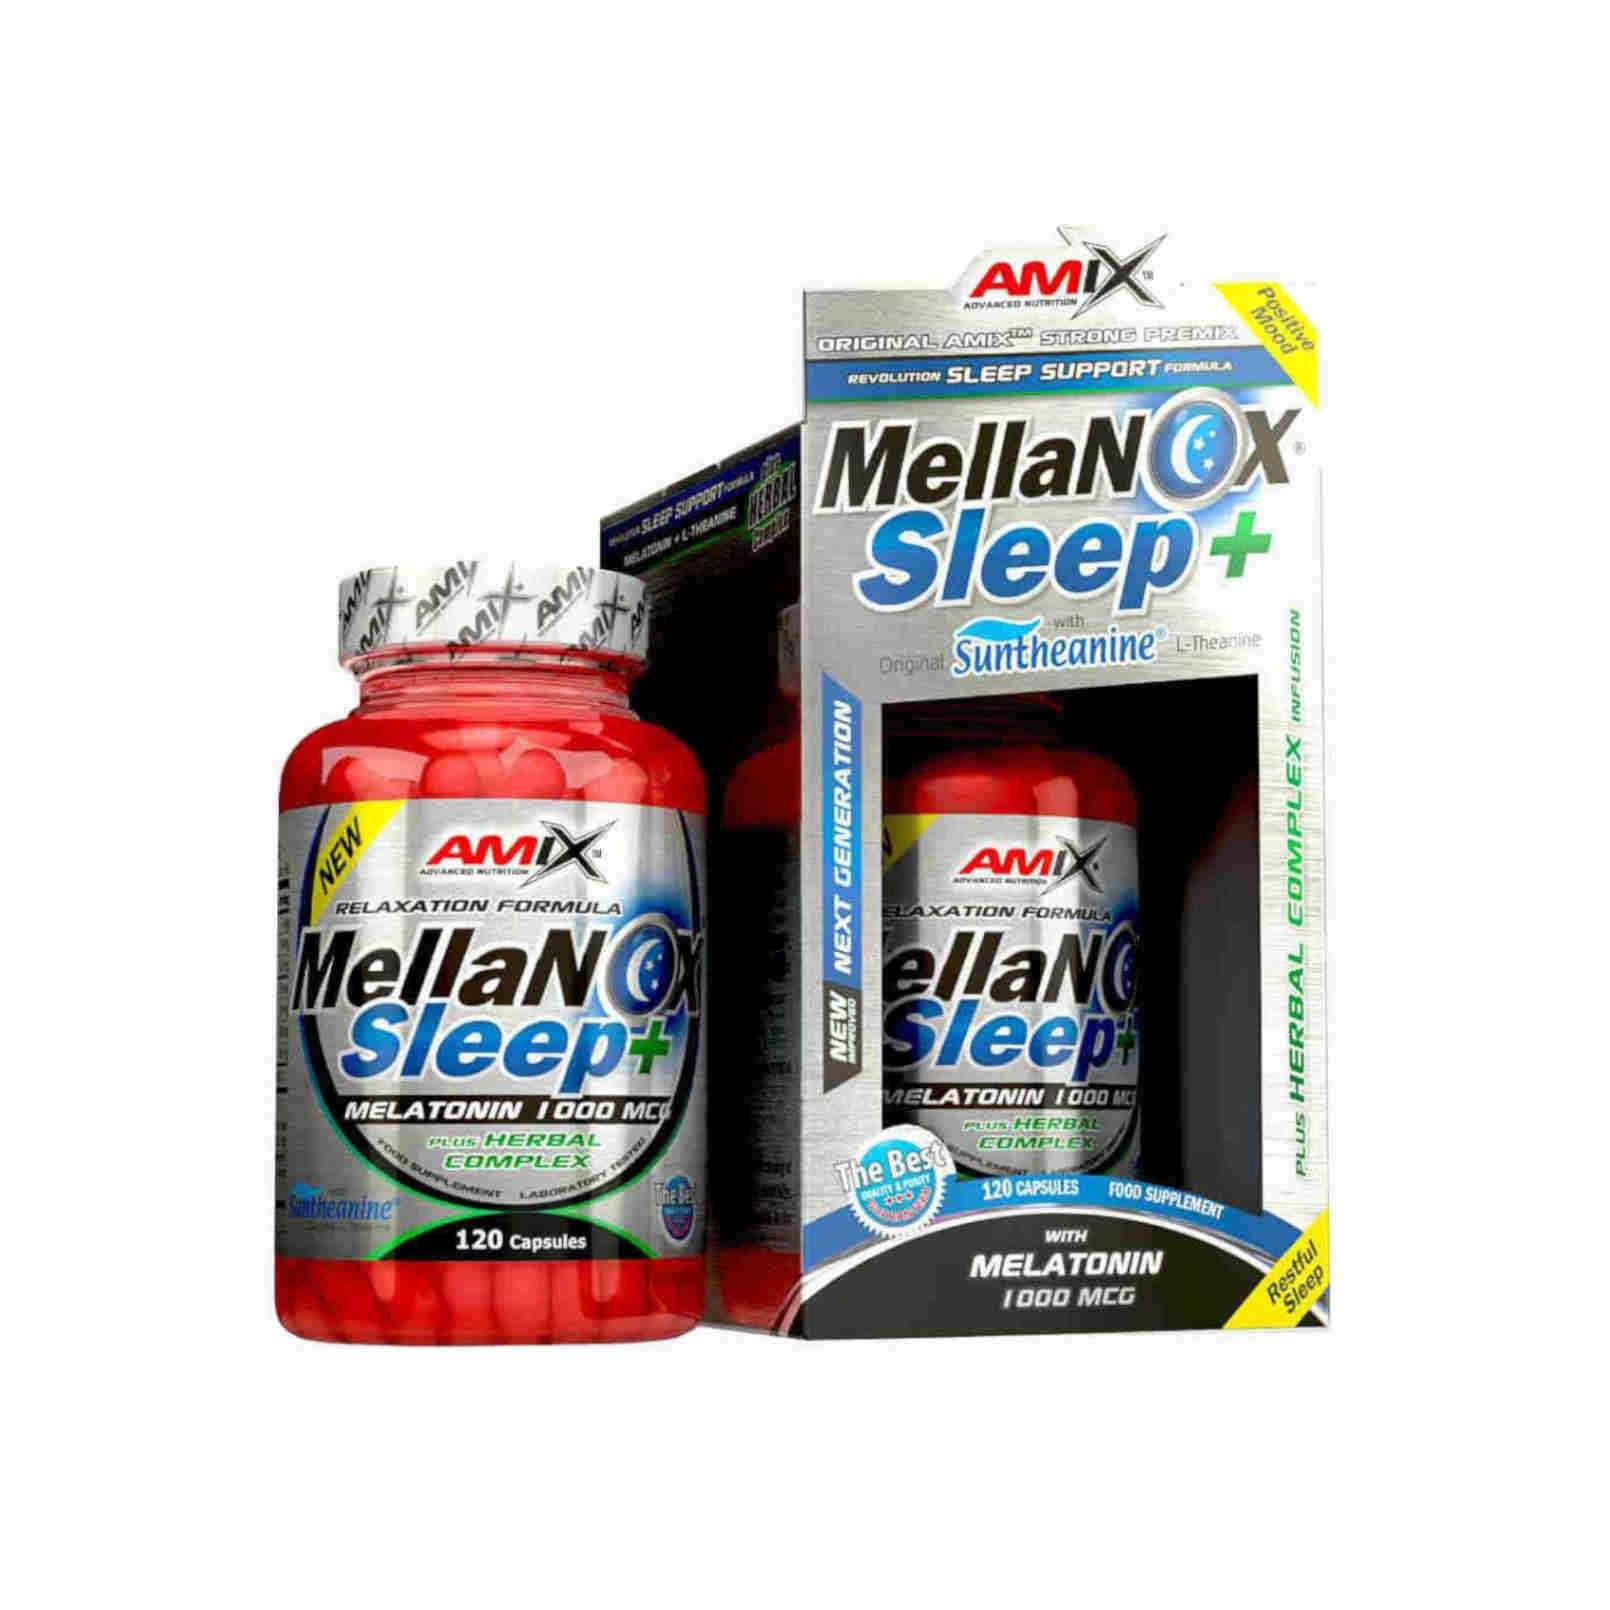 MELLANOX SLEEP+ - 120 caps